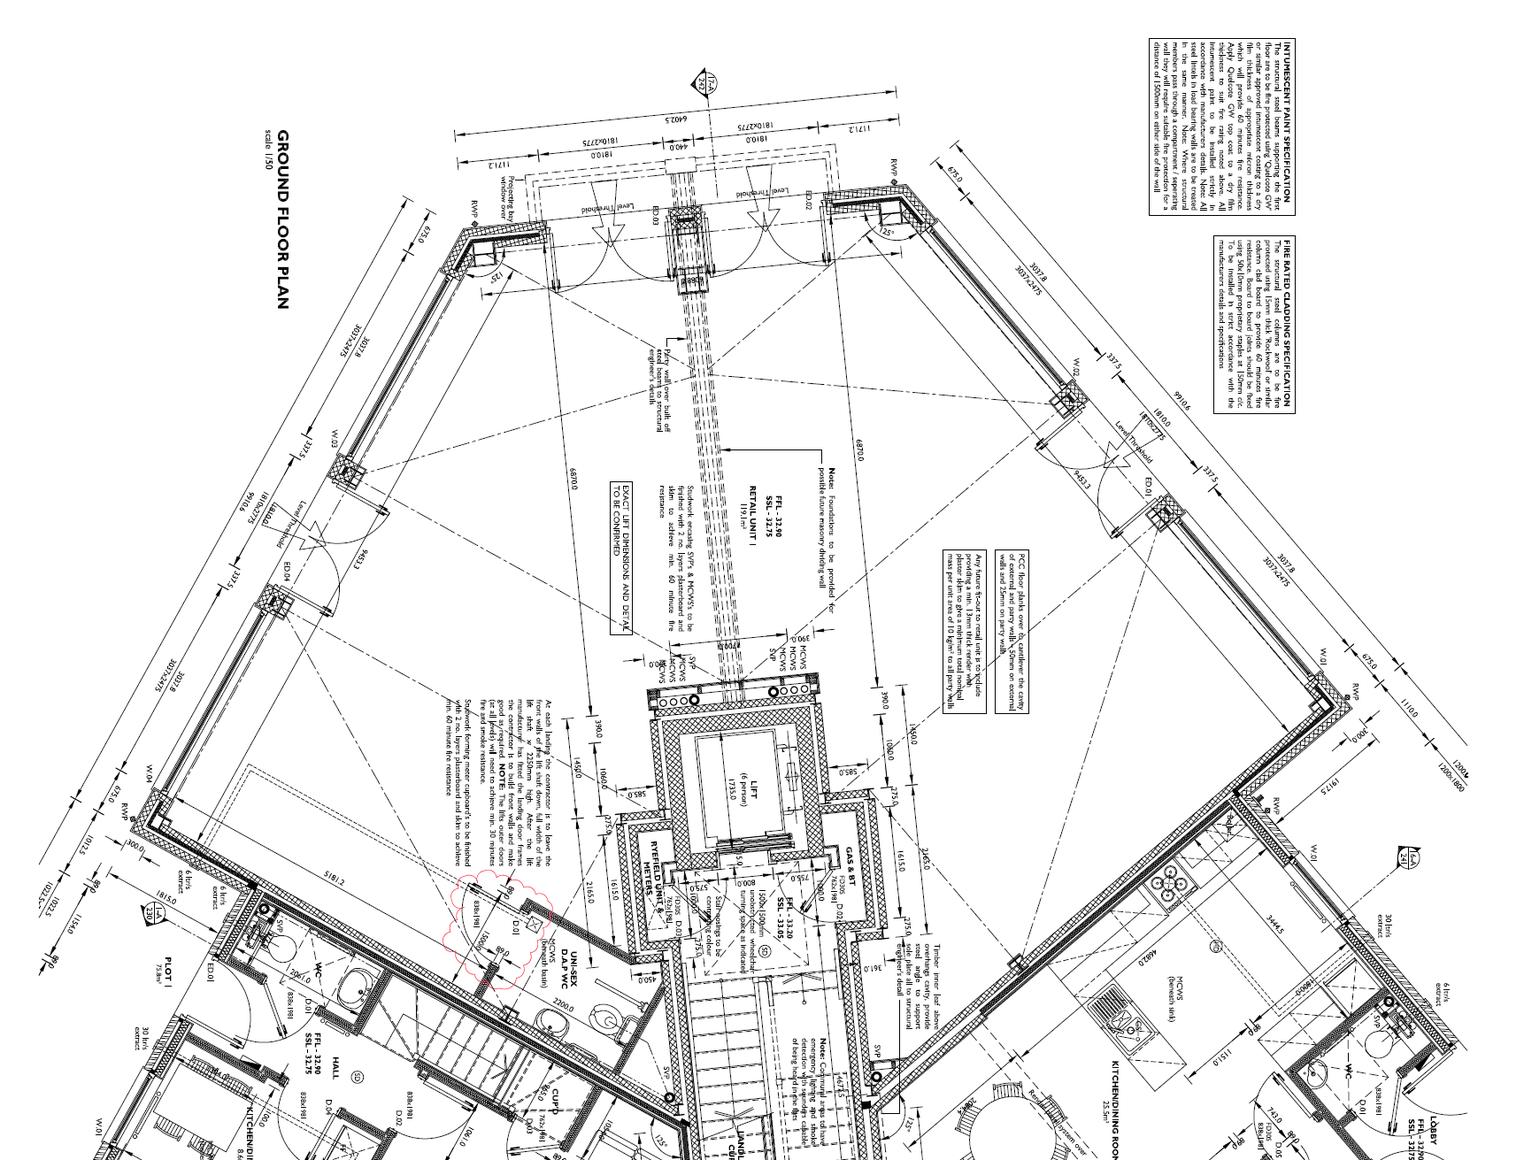 Floorplan for 21 and 23 Summer House Terrace, Yeovil